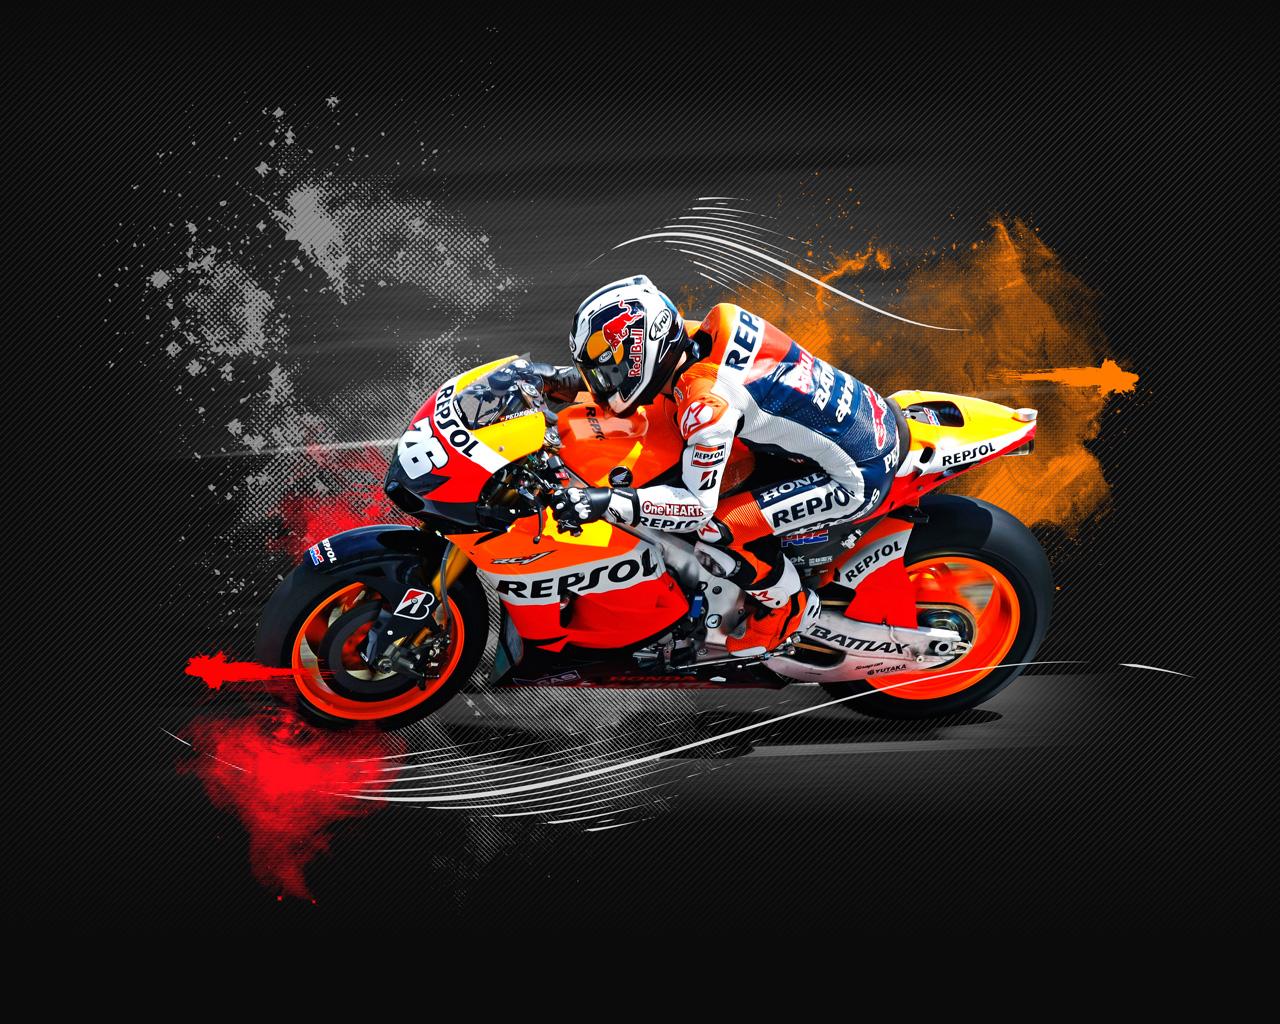 wallpapers hd for mac Dani Pedrosa MotoGp Wallpaper HD 1280x1024